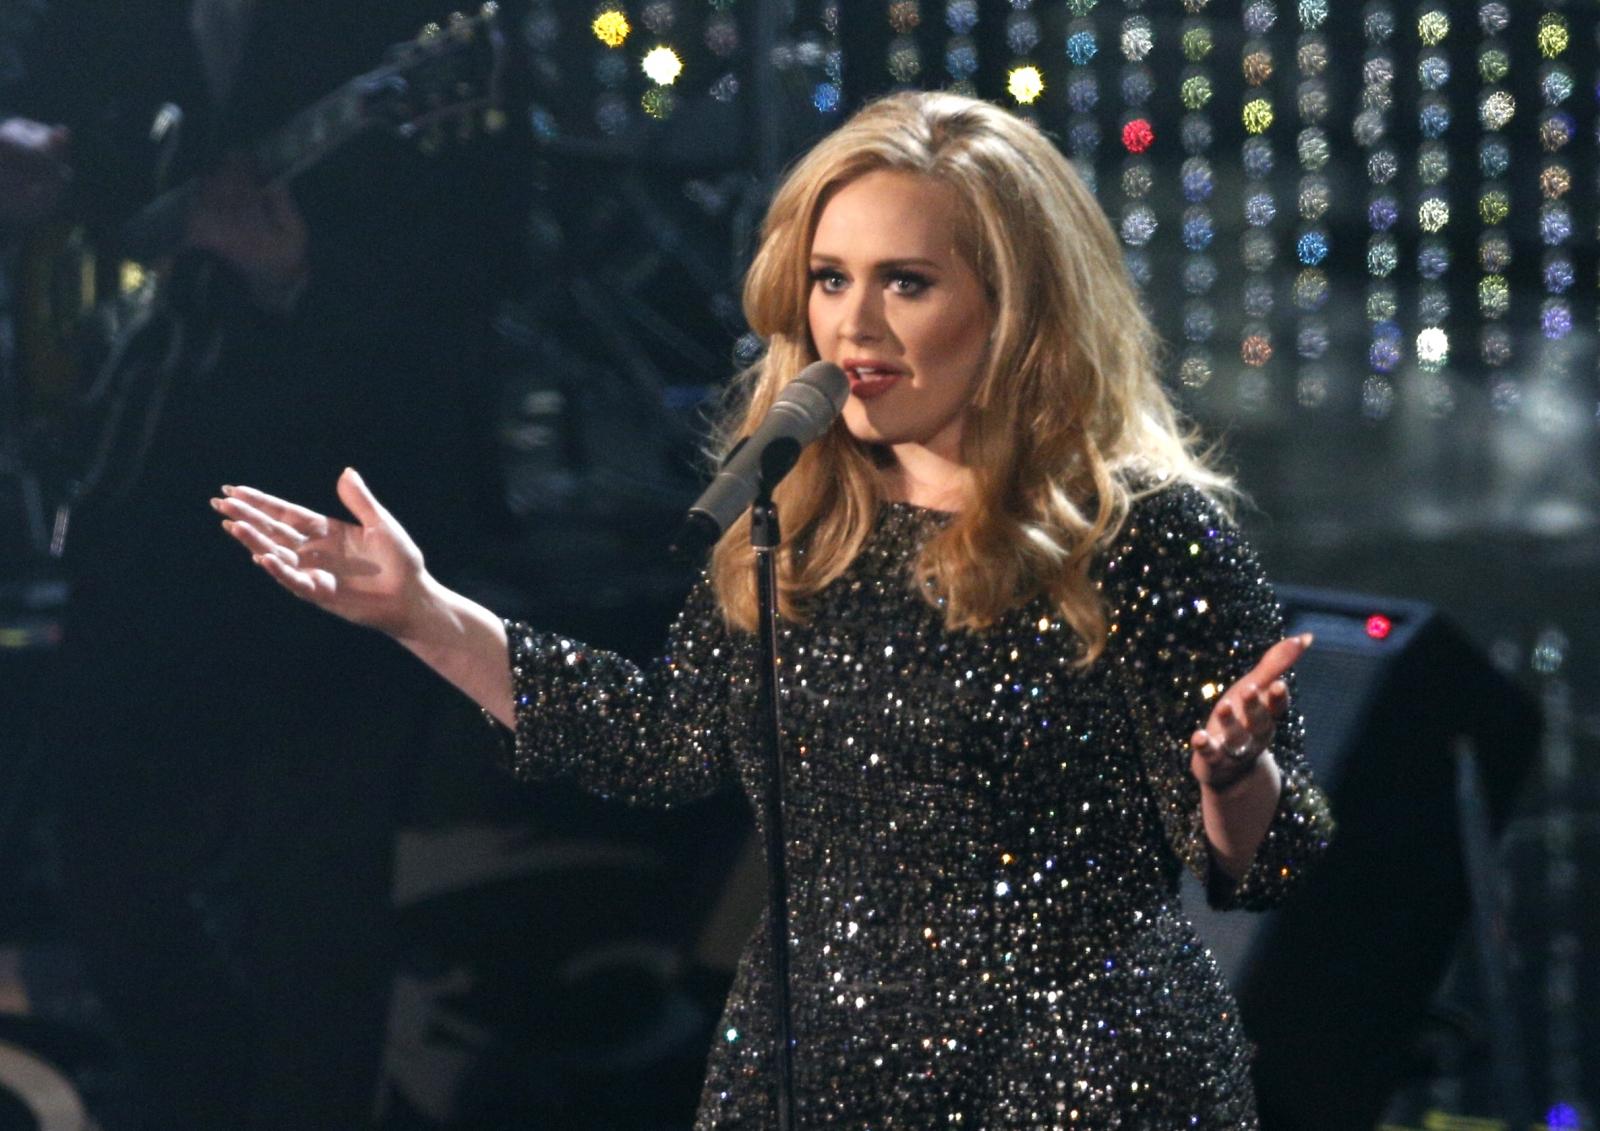 Adele New Album: Singer Favourite To Headline Glastonbury